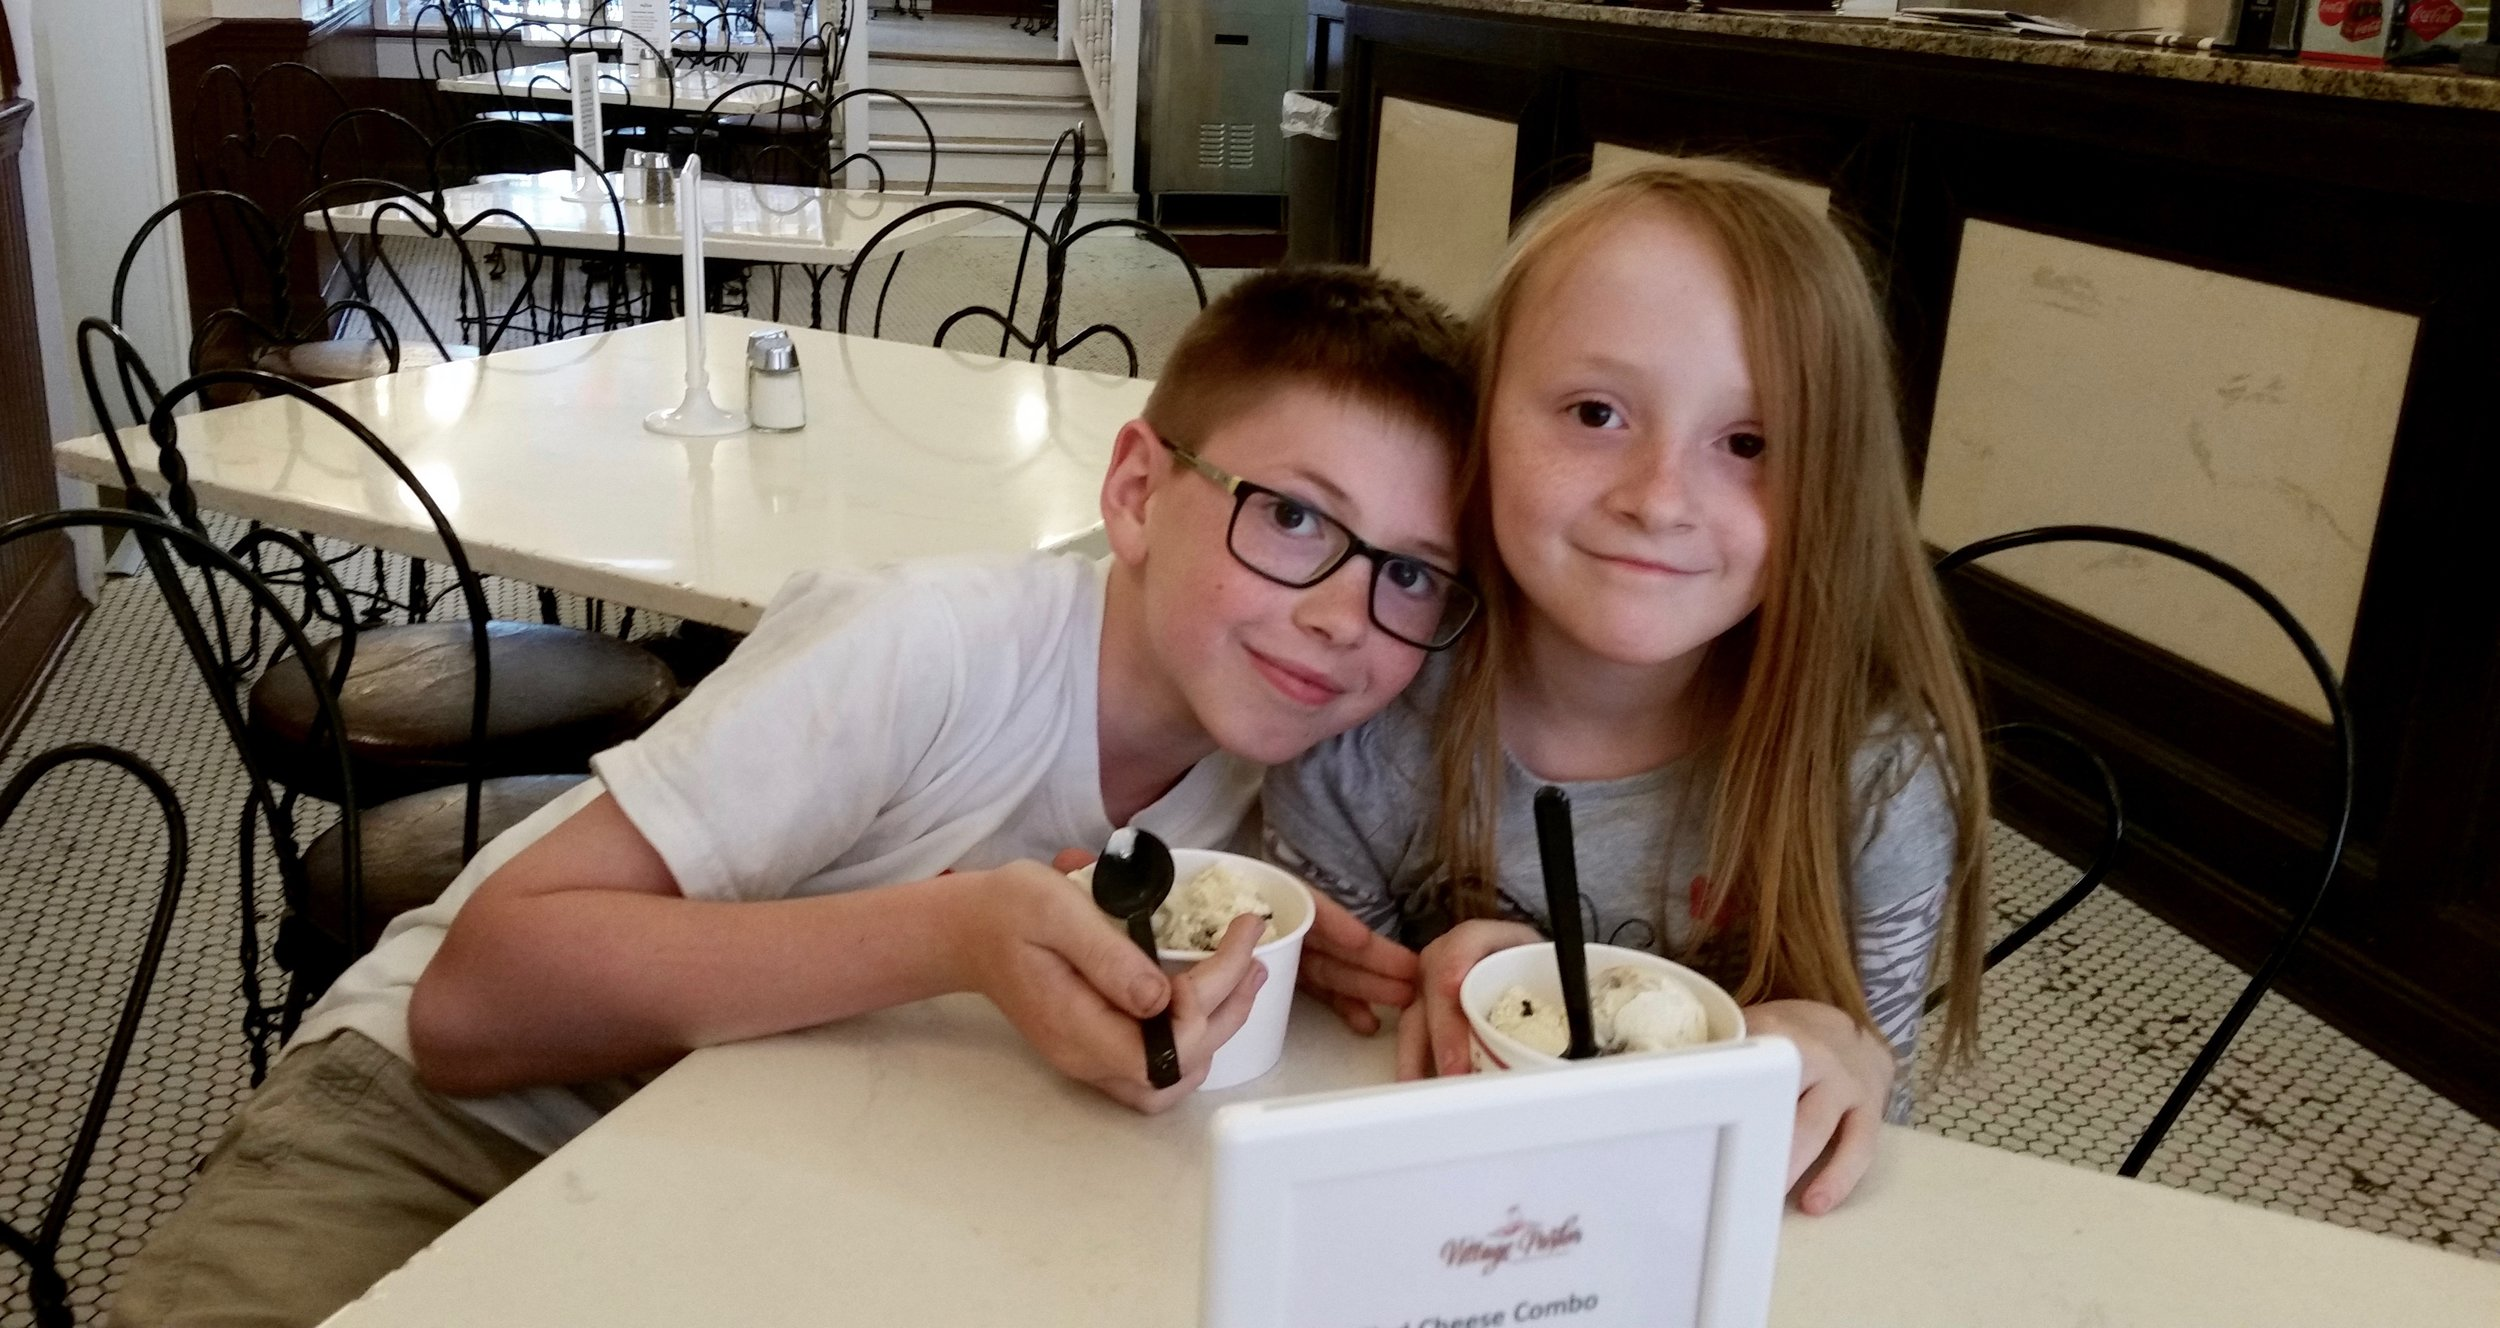 Kiddos at the Village Ice Cream Parlor